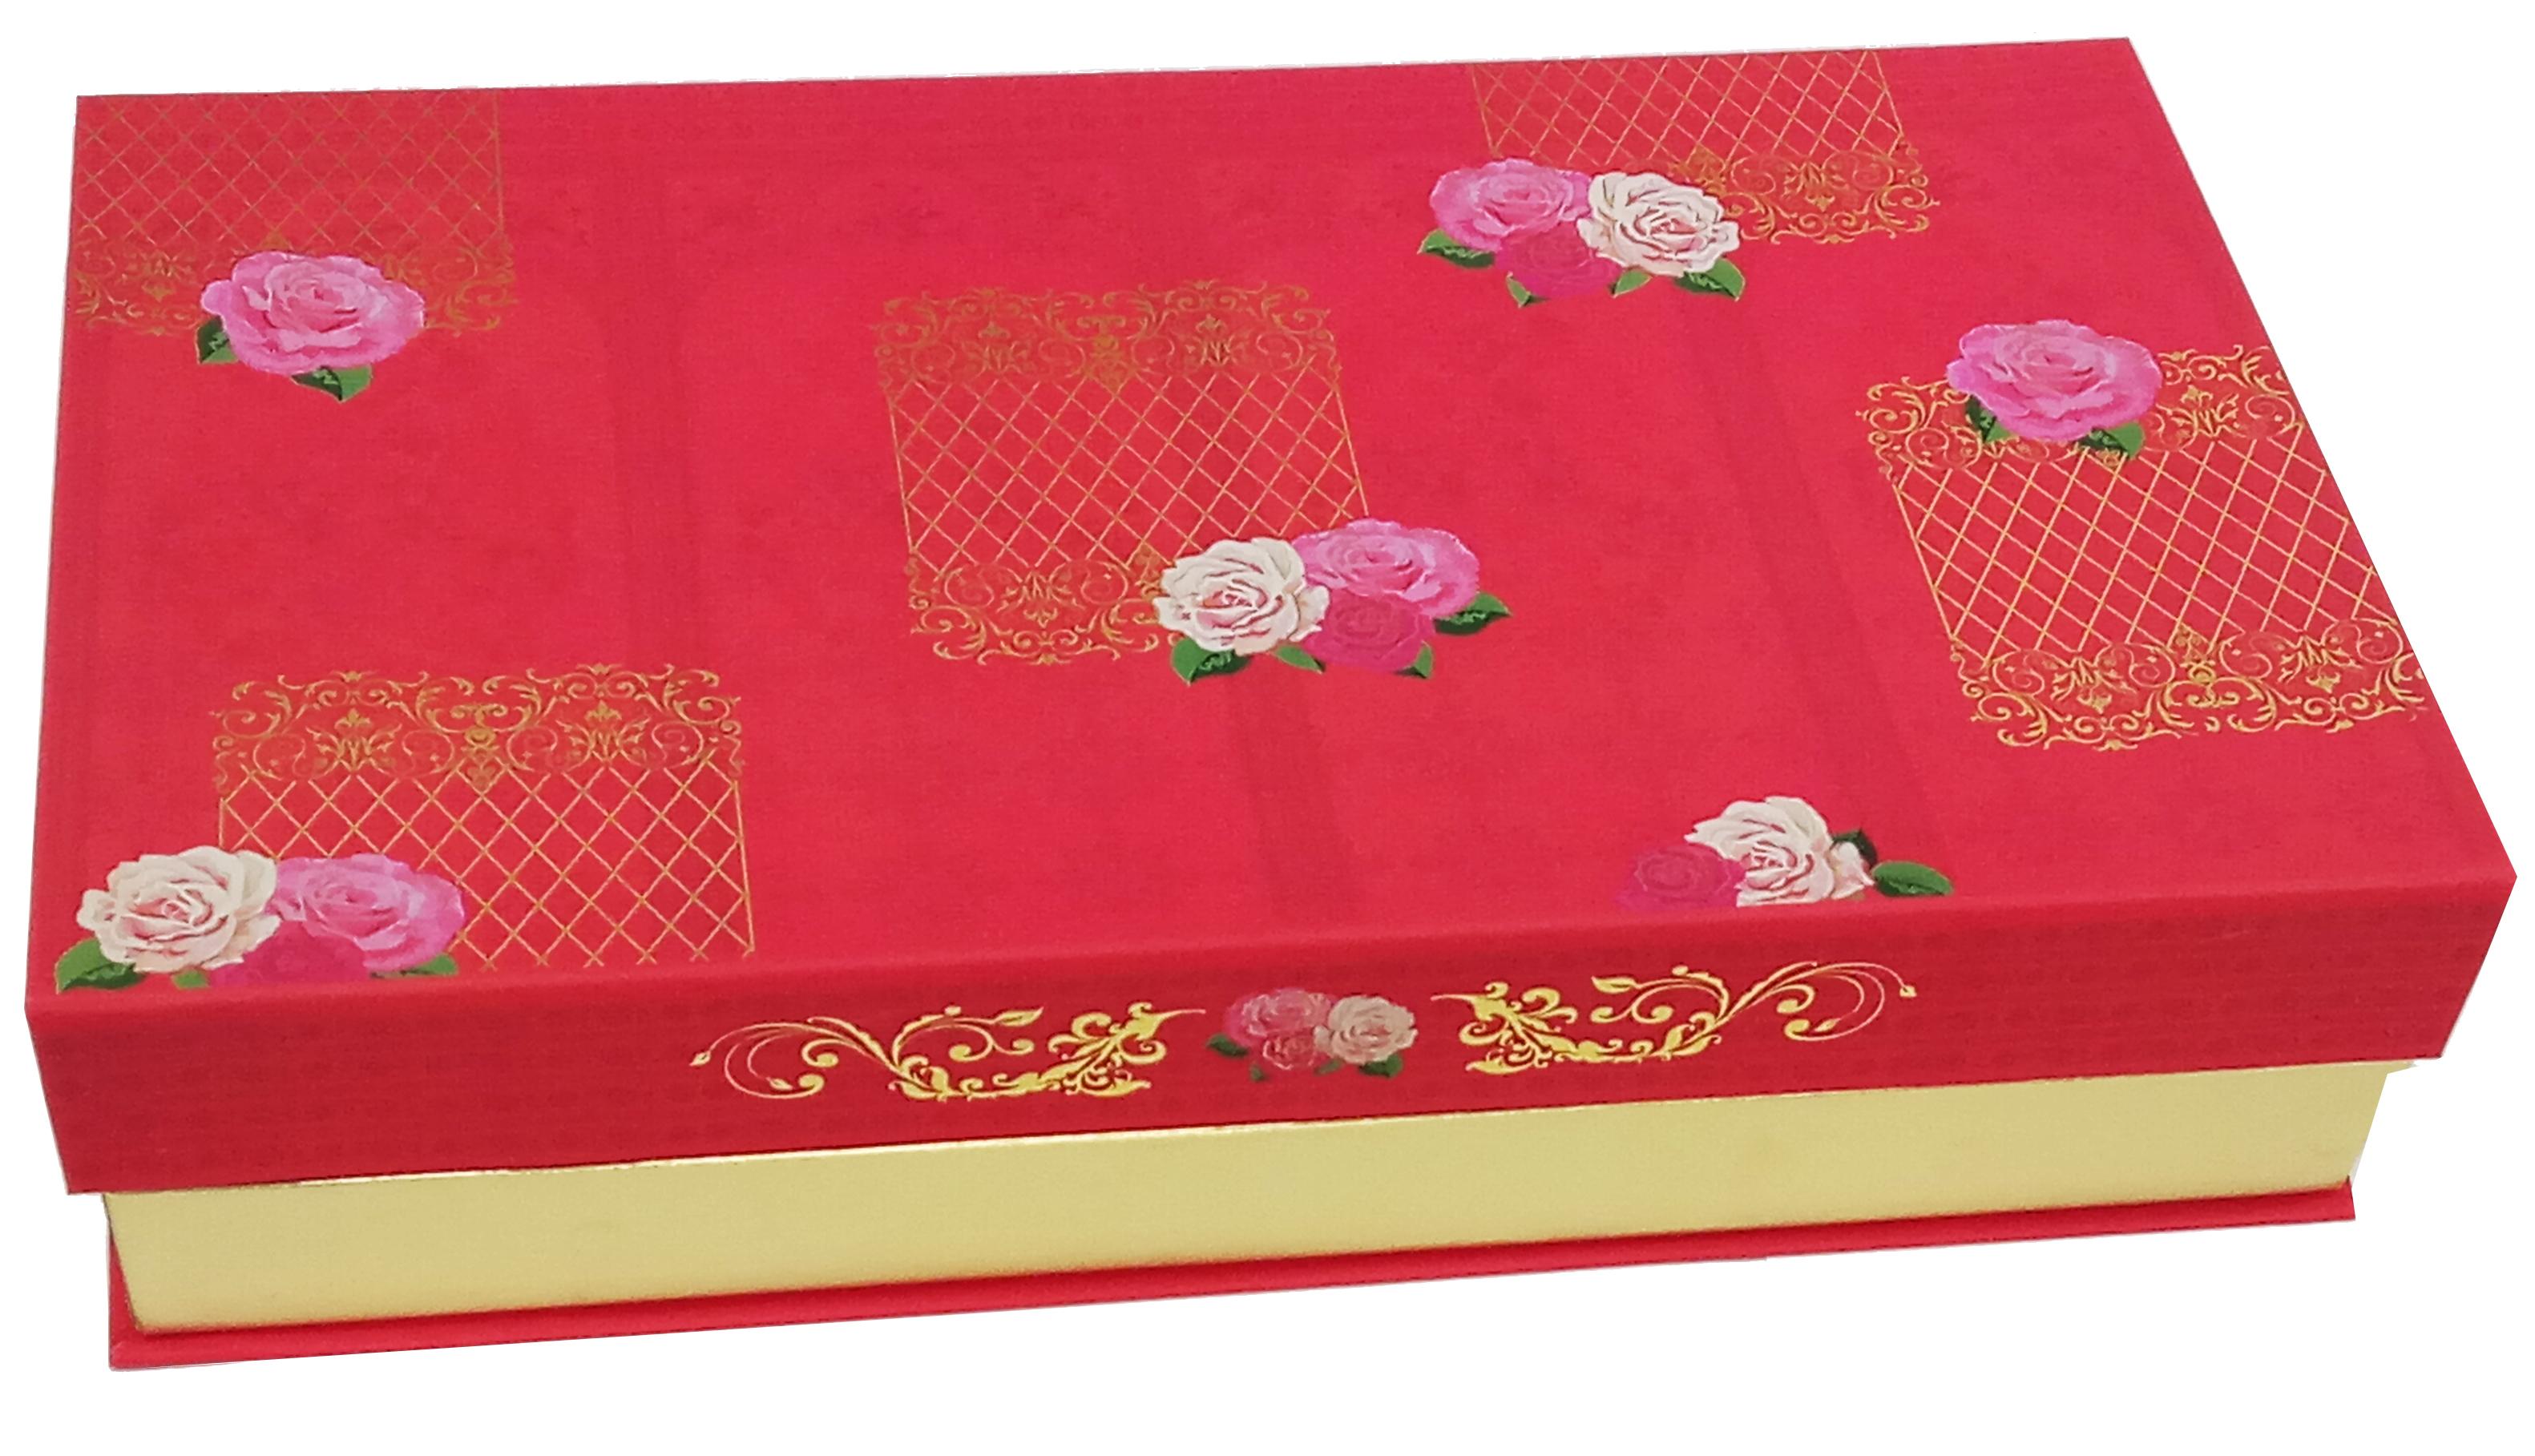 Azara Magnate 1 kg sweet box